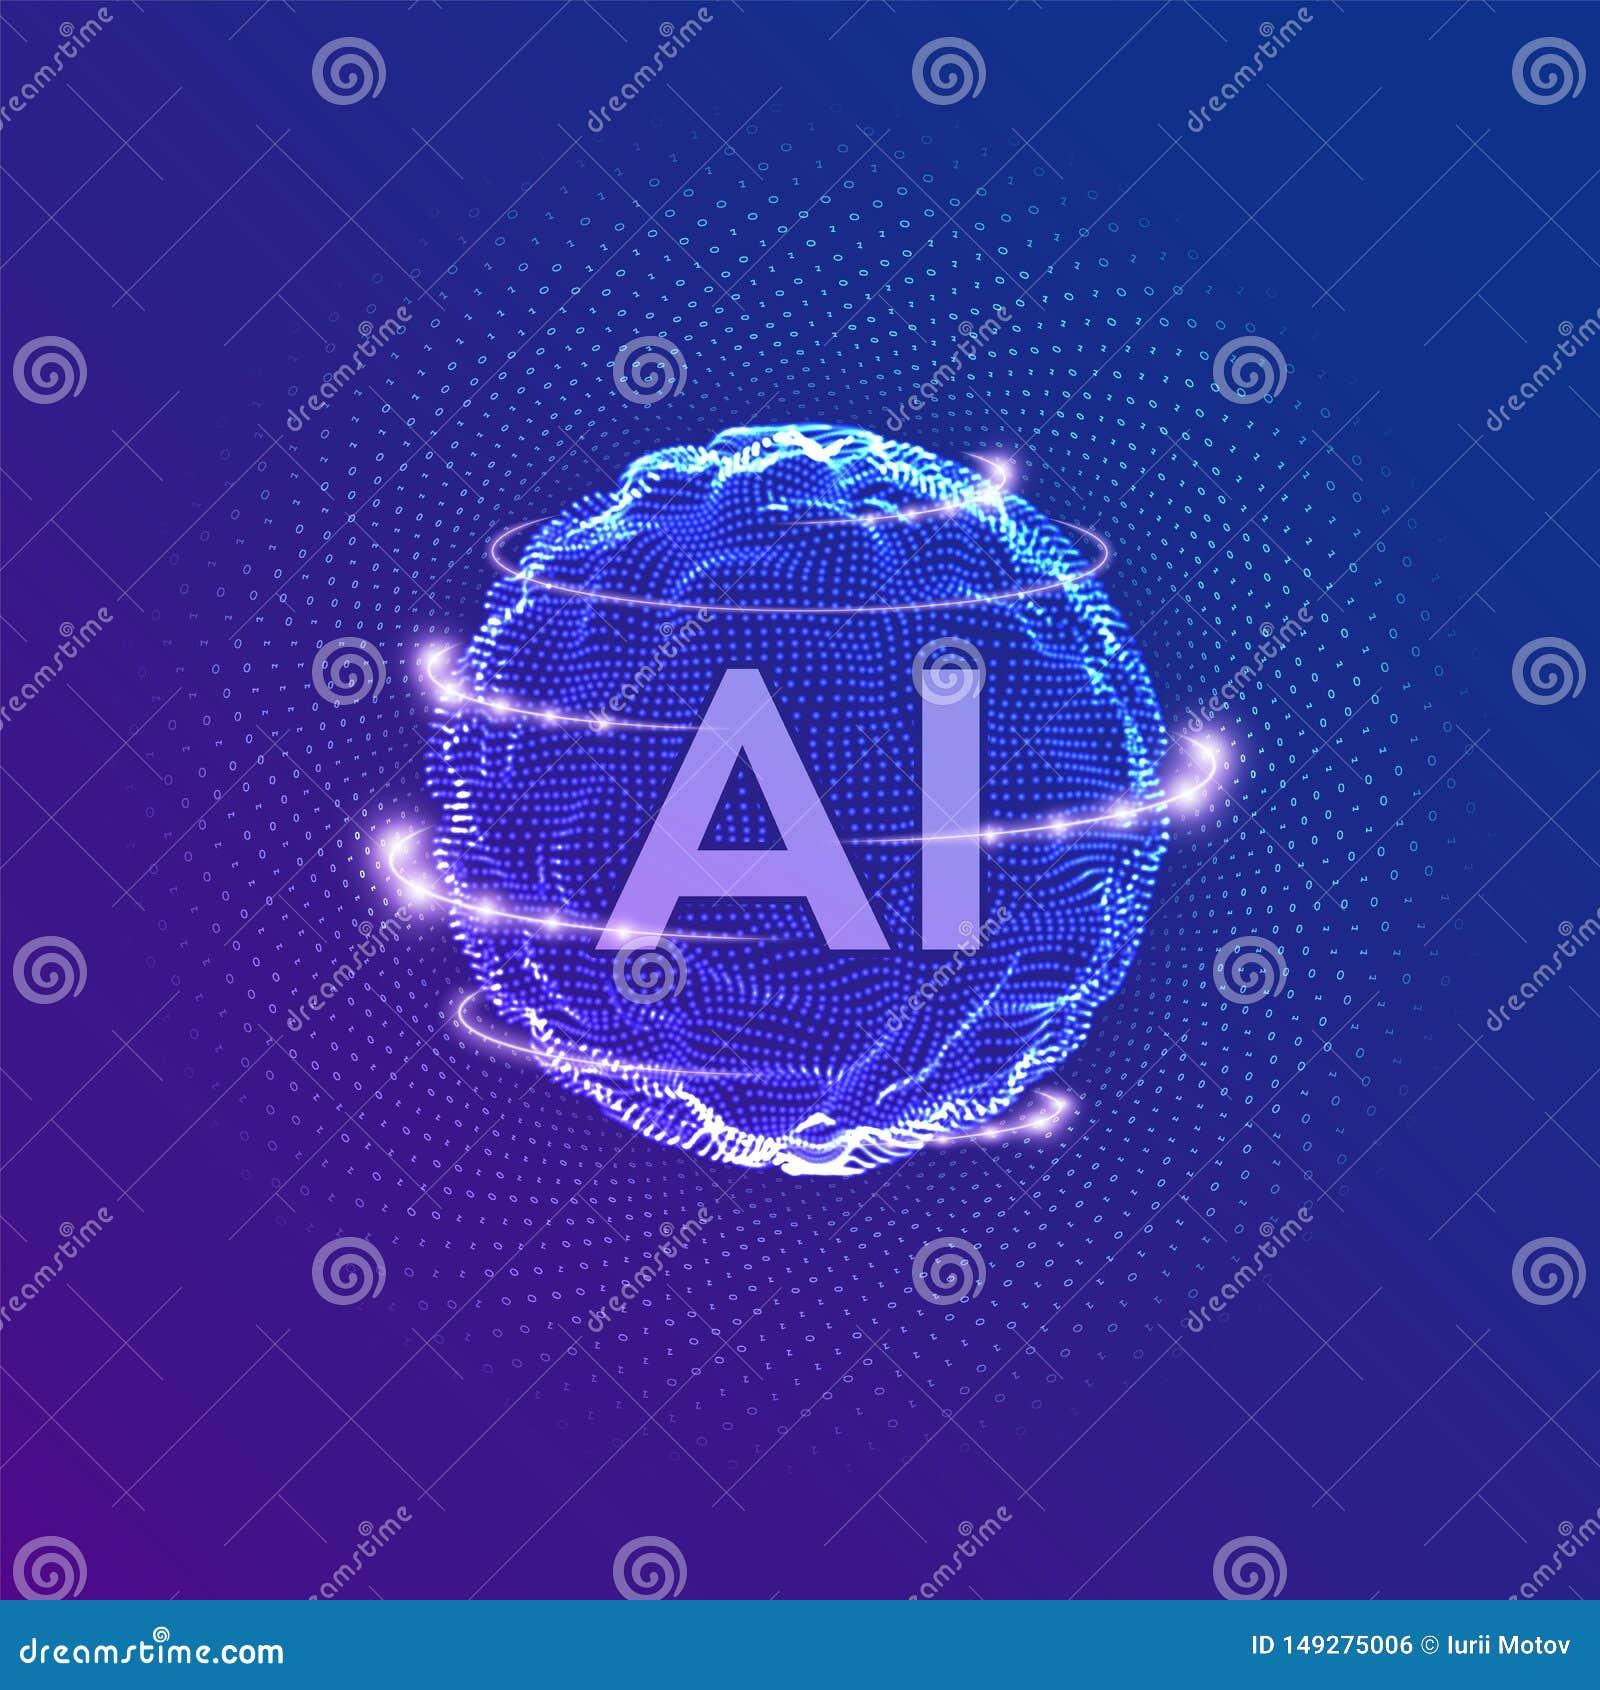 AI . Artificial Intelligence Logo . Artificial Intelligence